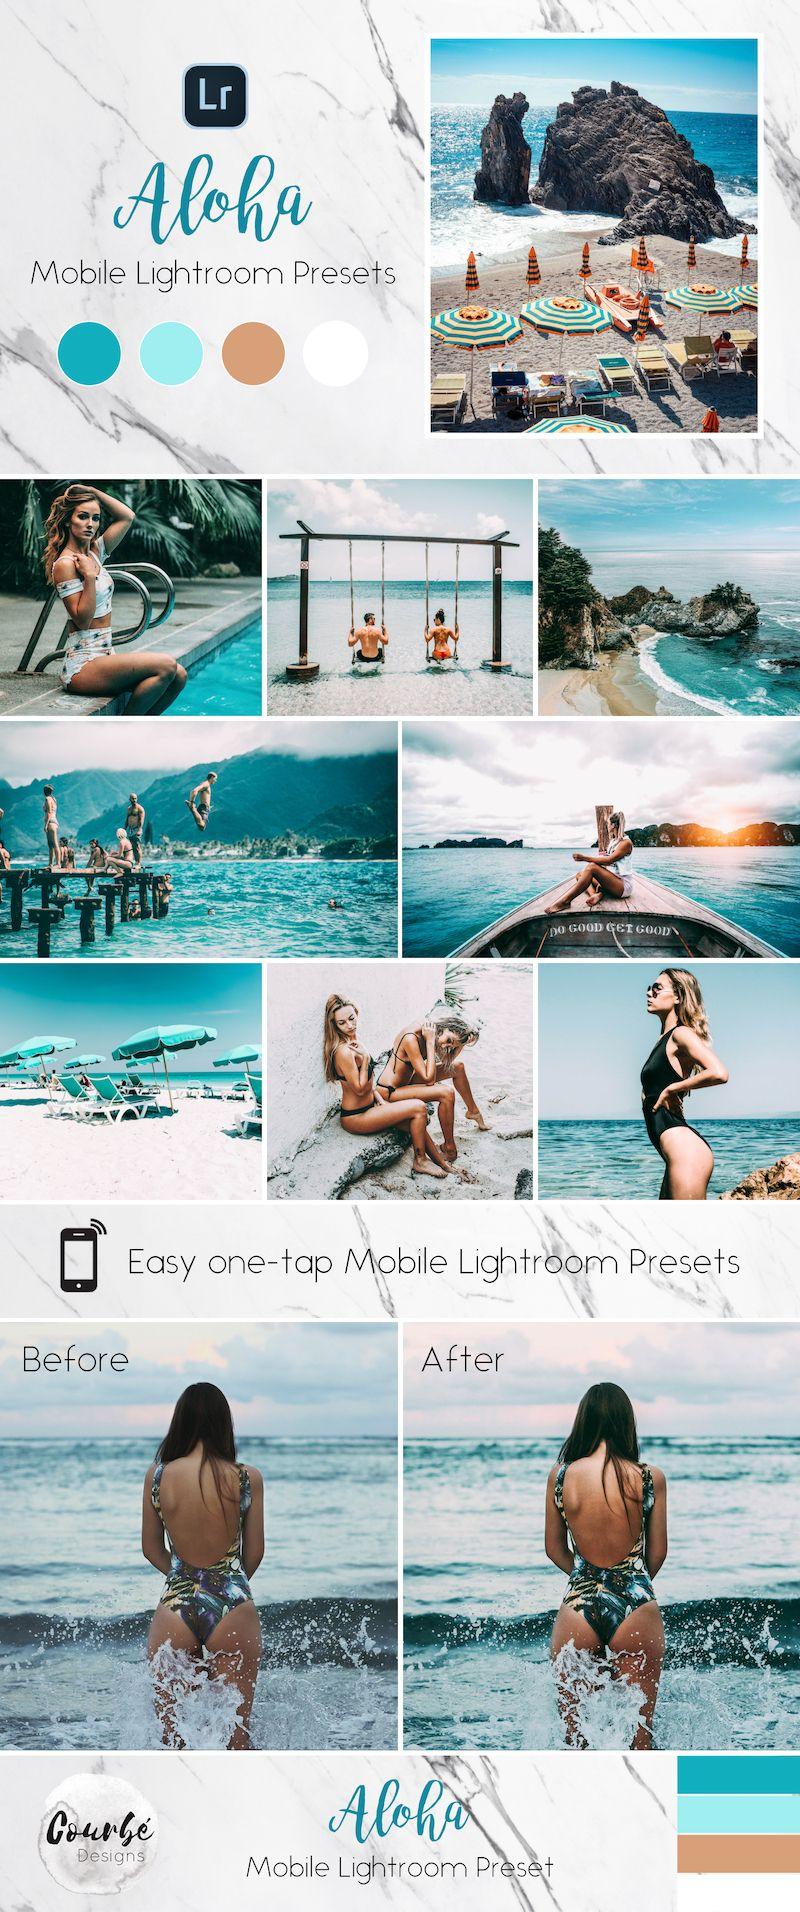 3 Mobile Lightroom Presets Aloha Instagram Blogger Travel Lifestyle Presets Lightroom Lightroom Presets Instagram Aesthetic